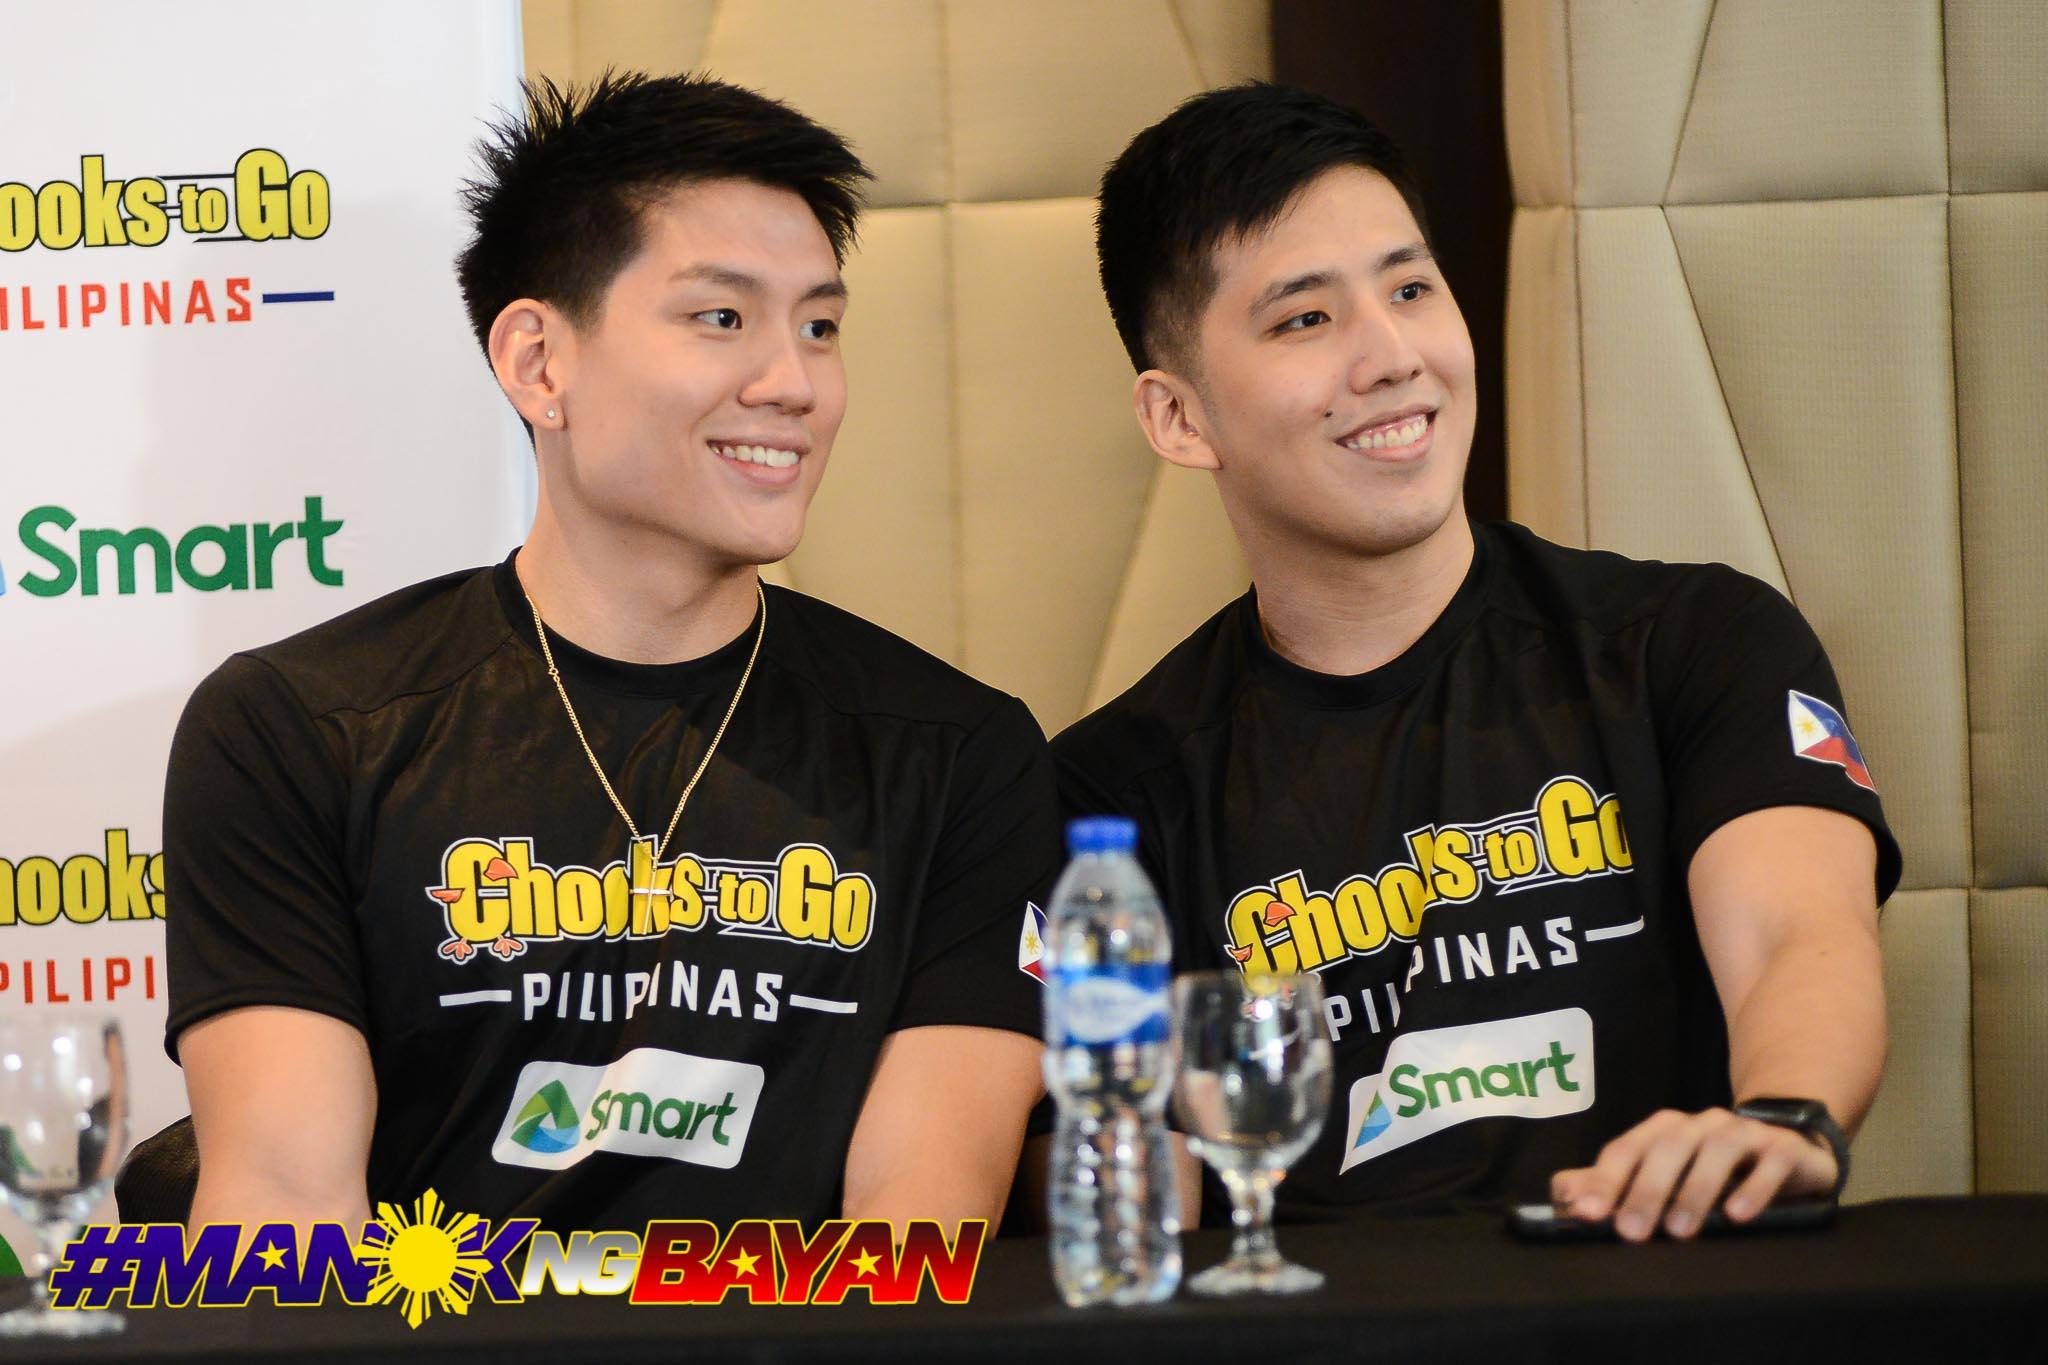 Philippine Sports News - Tiebreaker Times Teng brothers relish reunion in Chooks-to-Go Pilipinas Basketball News  Jeron Teng Jeric Teng Chooks-to-Go Pilipinas Chooks-to-Go 2017 FIBA Asia Champions Cup